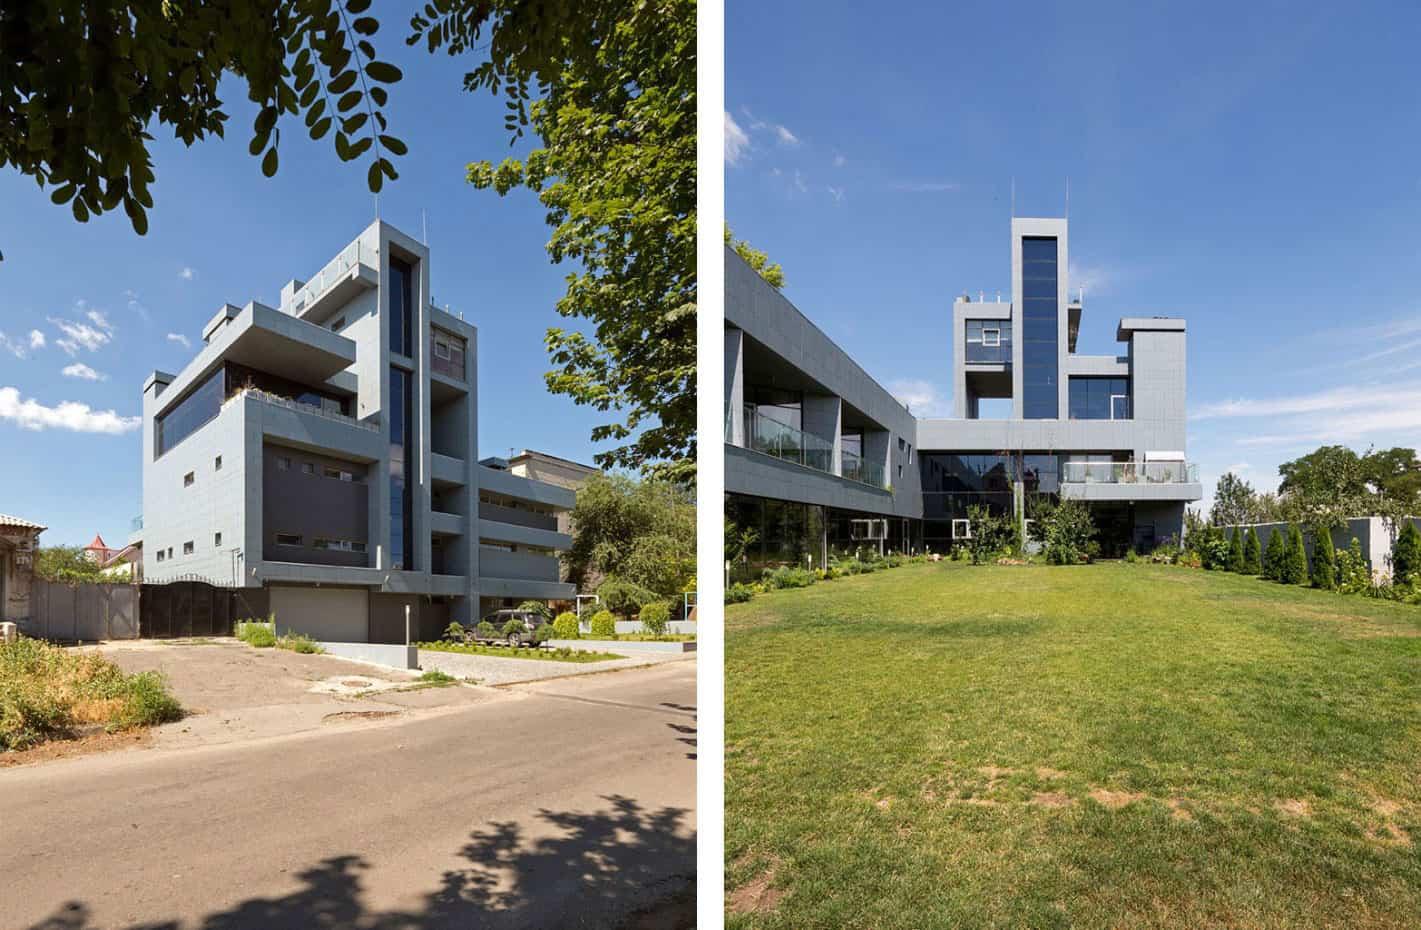 House in Dnepropetrovsk by Yakusha Design (1)